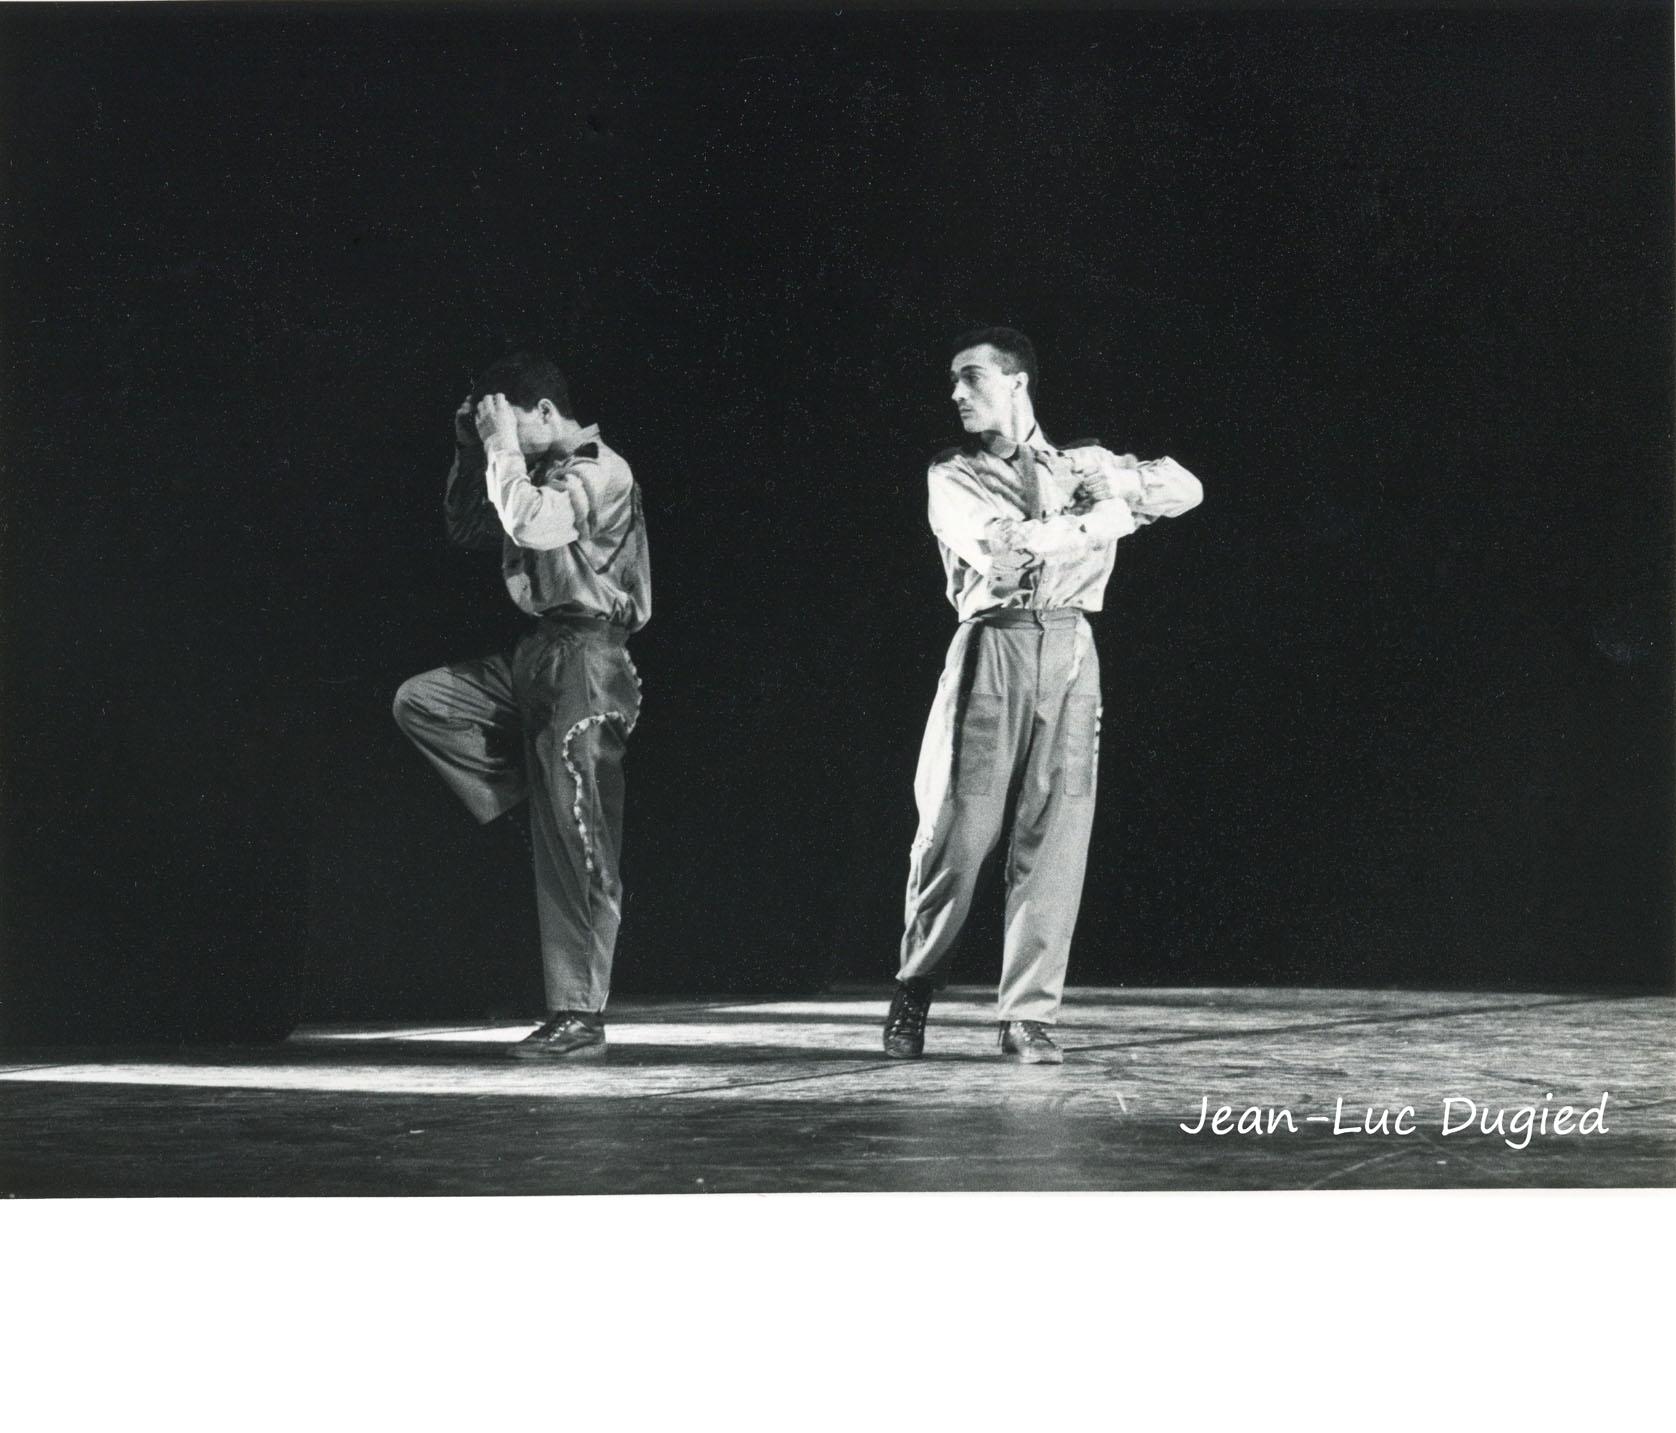 38 Kelemenis Michel et Preljocaj Angelin - aventure coloniale - 1984